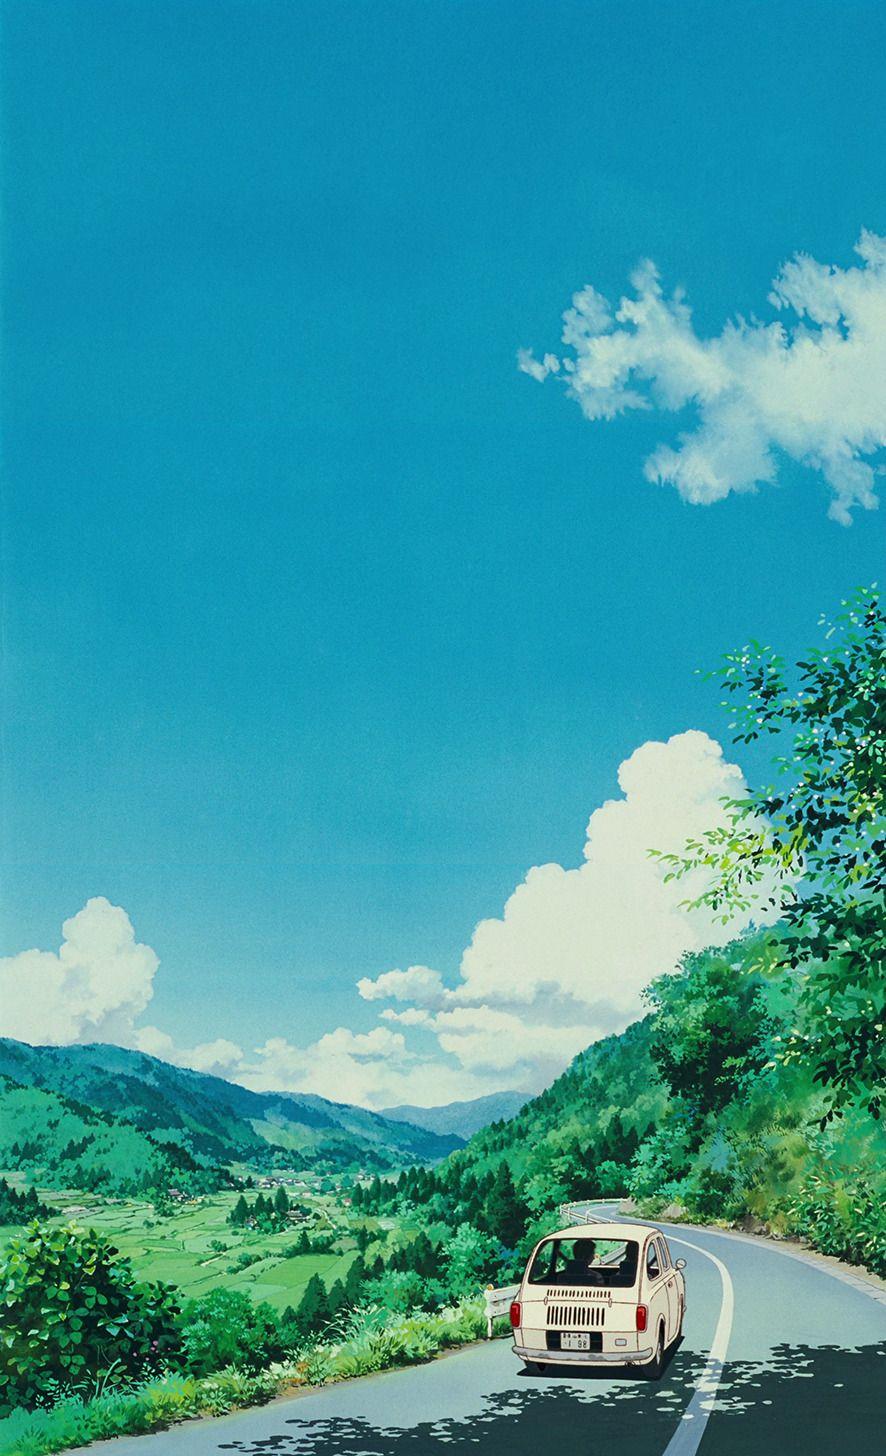 We Love Studio Ghibli Photo スタジオジブリ 夏イラスト